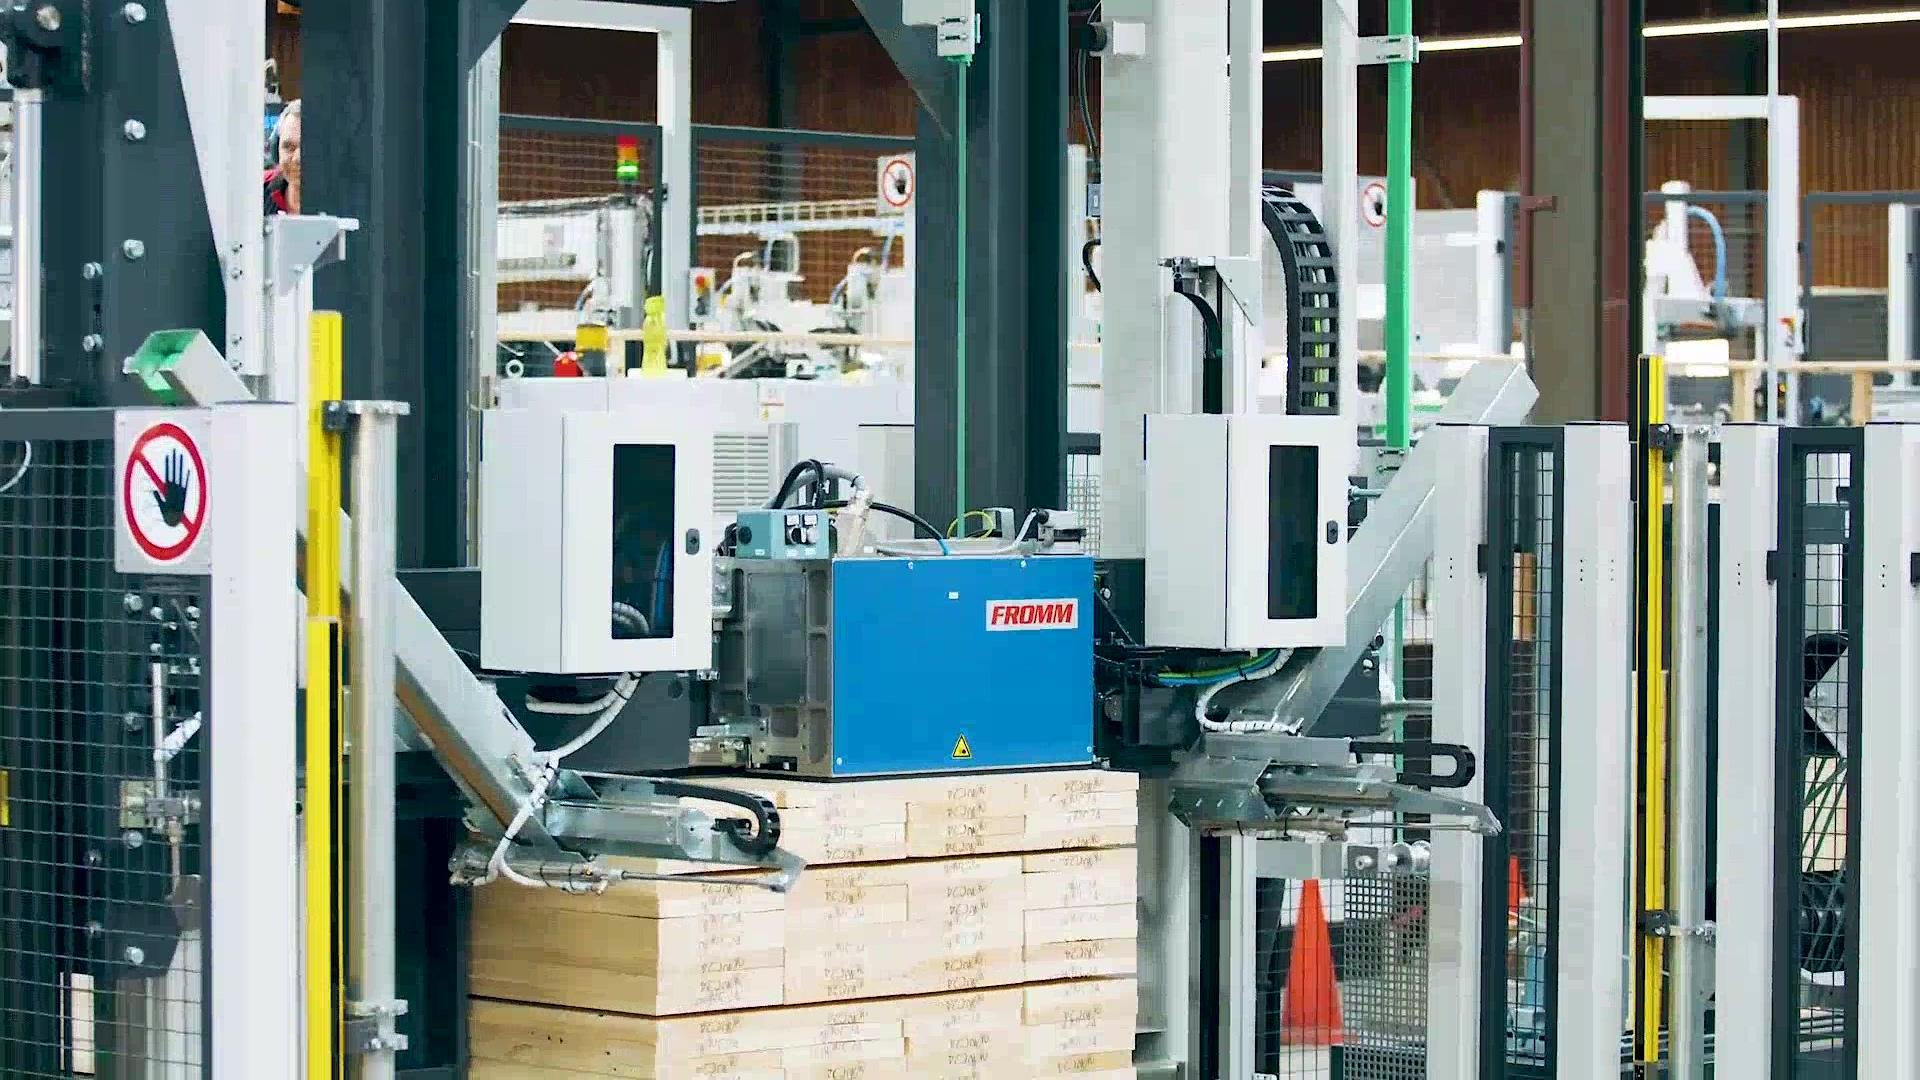 PM100 Machined WOOD, Corners, Bunk & HV Press_Trim (1)-1